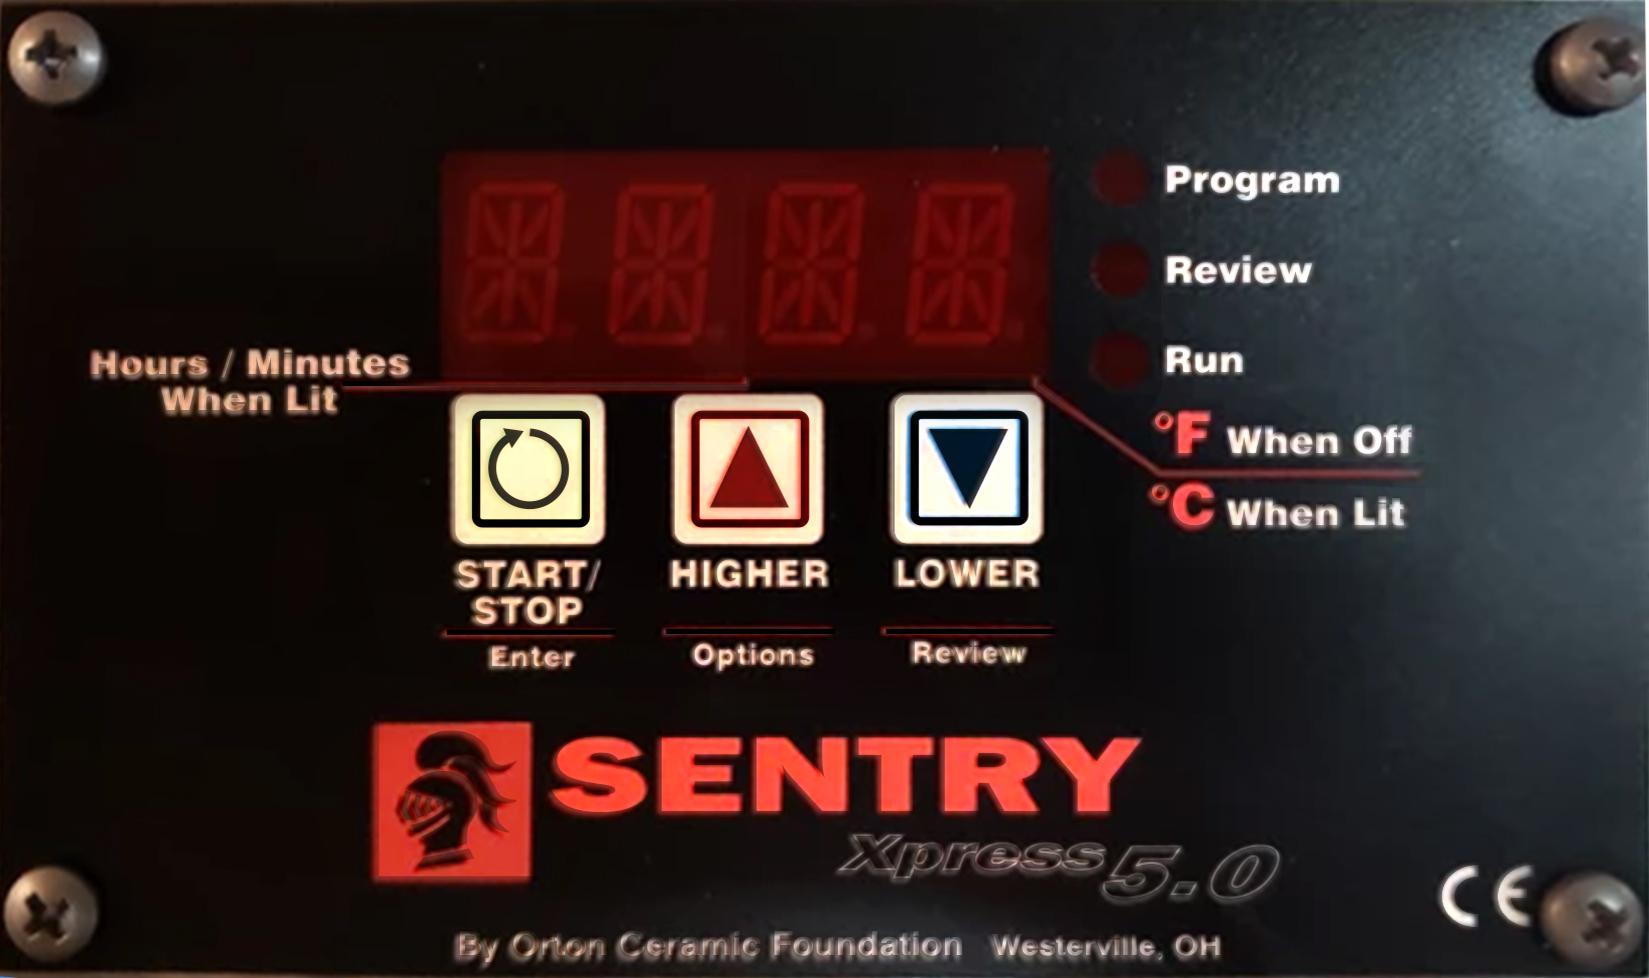 sentry-xpress-5.jpg